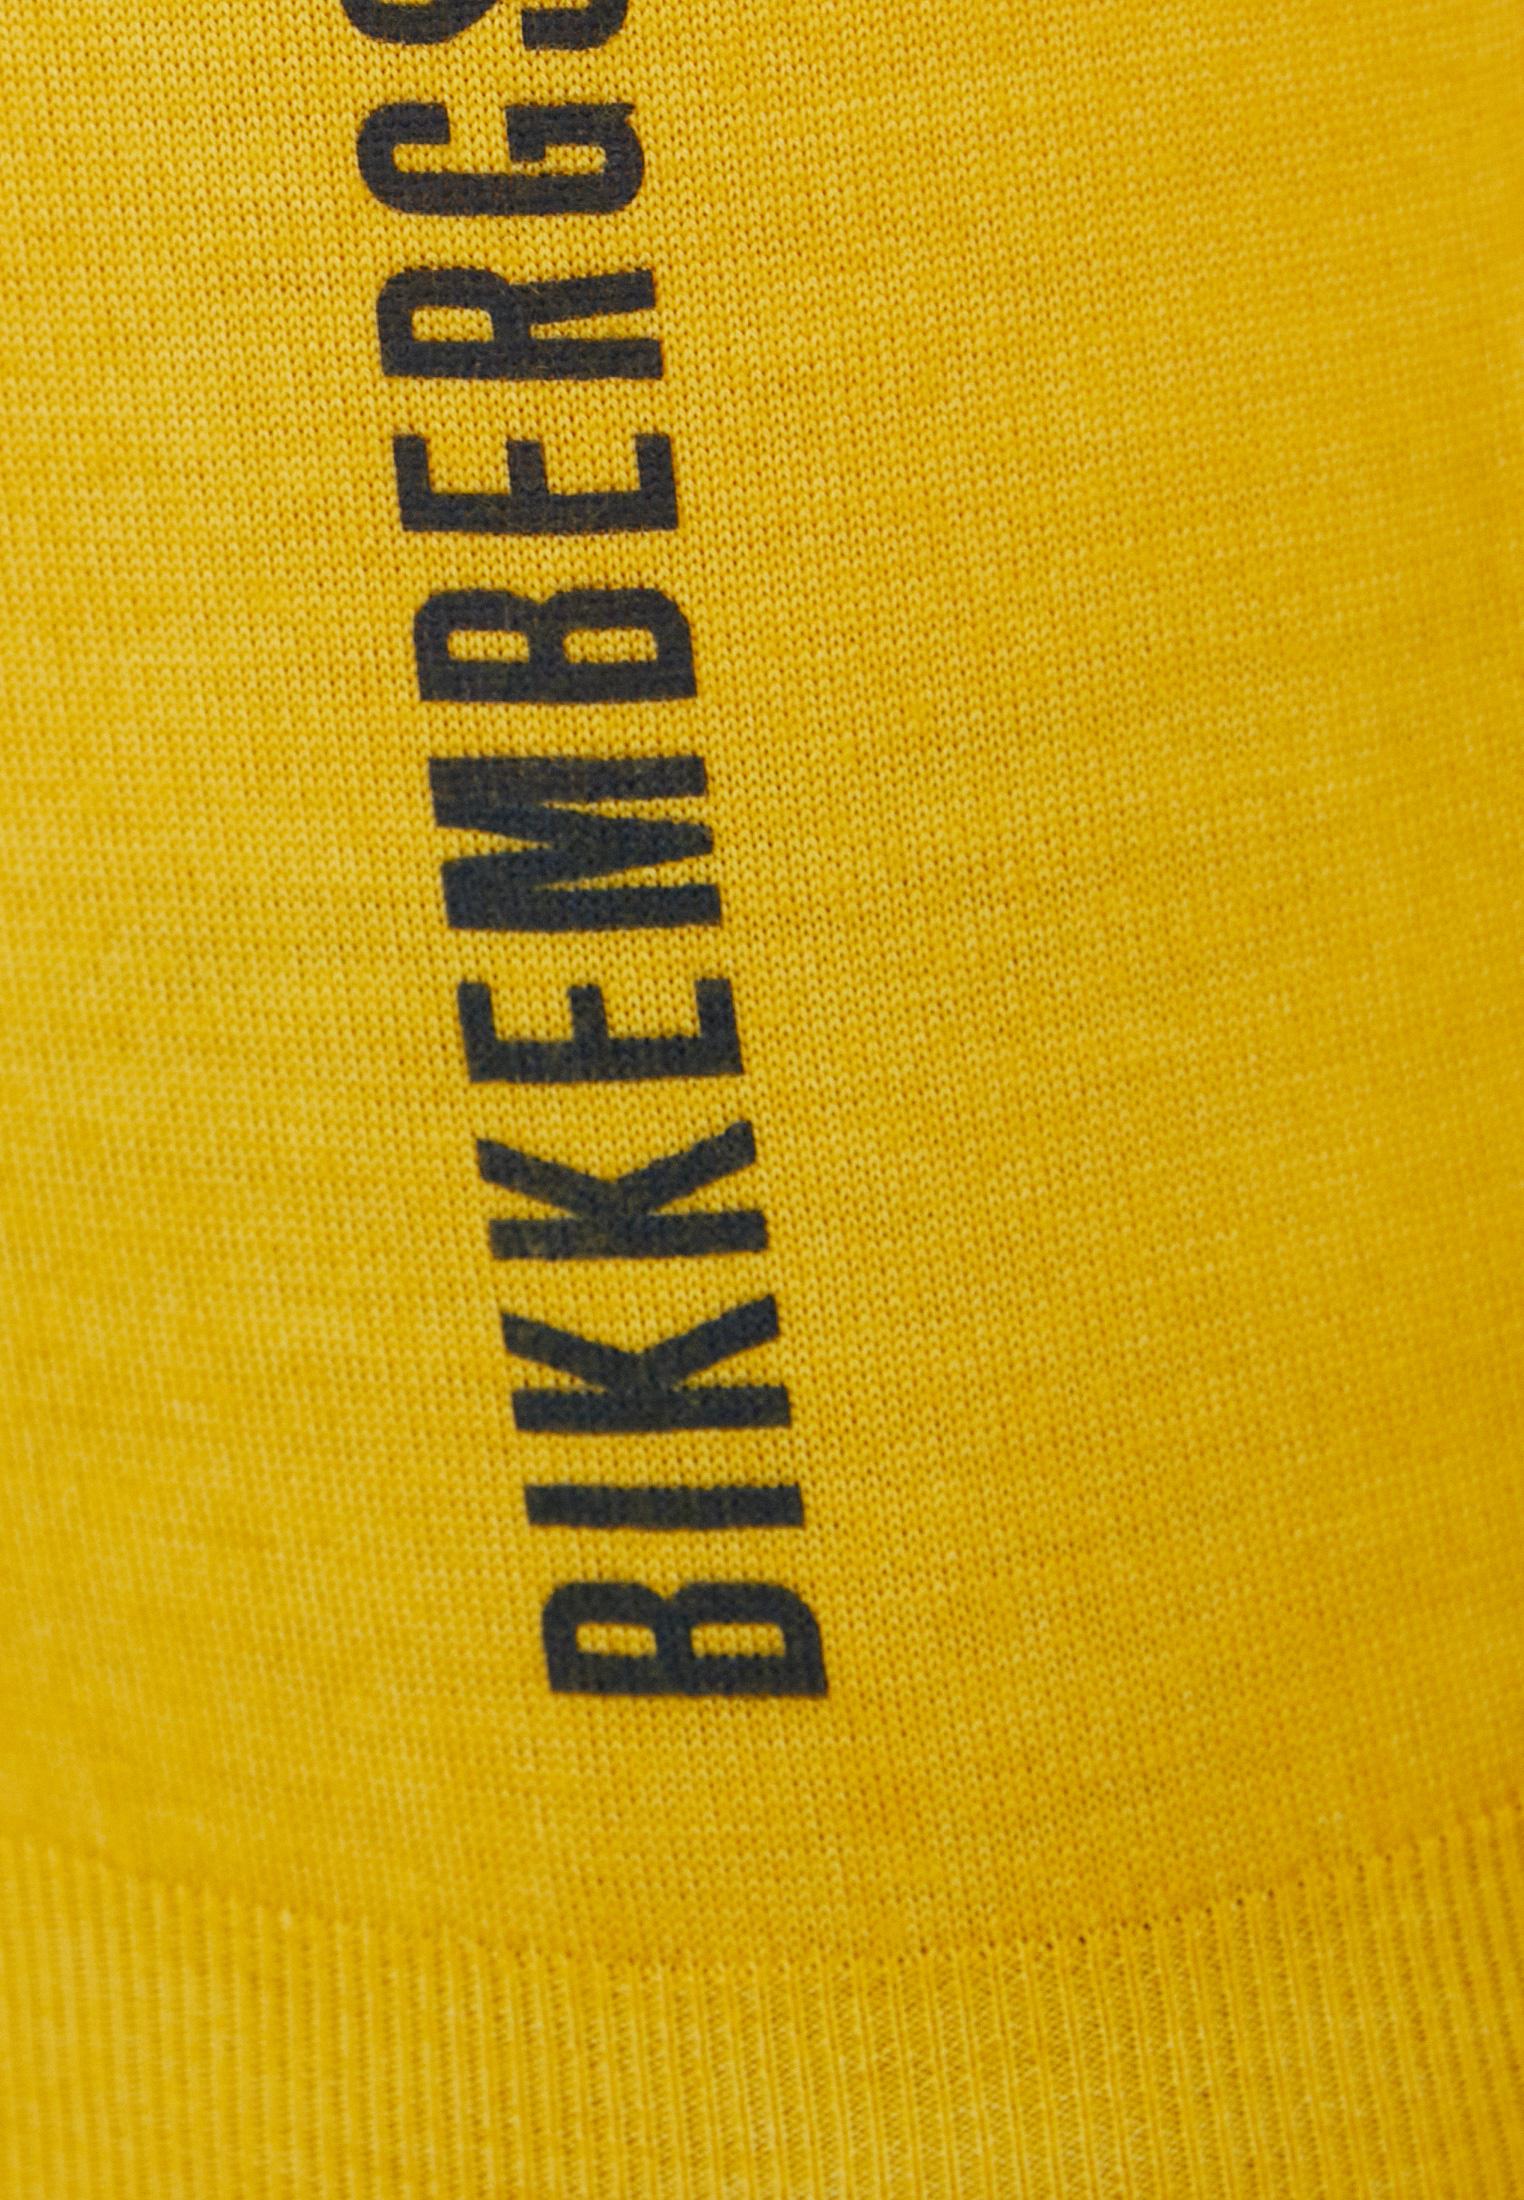 Джемпер Bikkembergs (Биккембергс) C S G44 11 X 1316: изображение 5